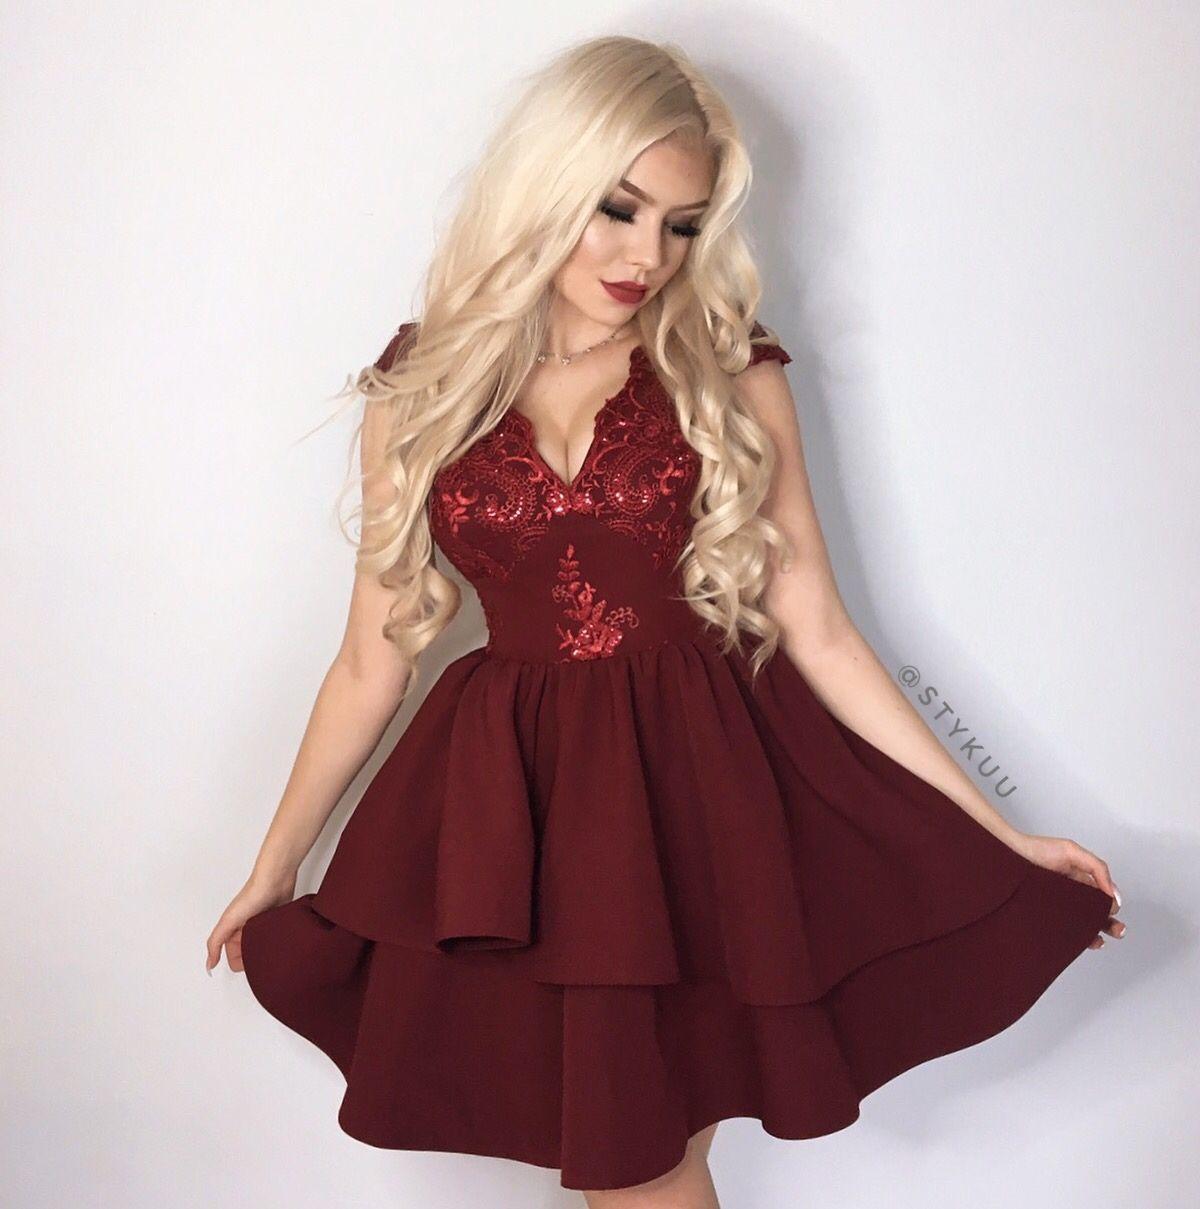 Bordowa Rozkloszowana Sukienka Uszyta W Polsce Piekna Sukienka Na Wesele Illuminate Pl Dresses Evening Dresses Illuminations